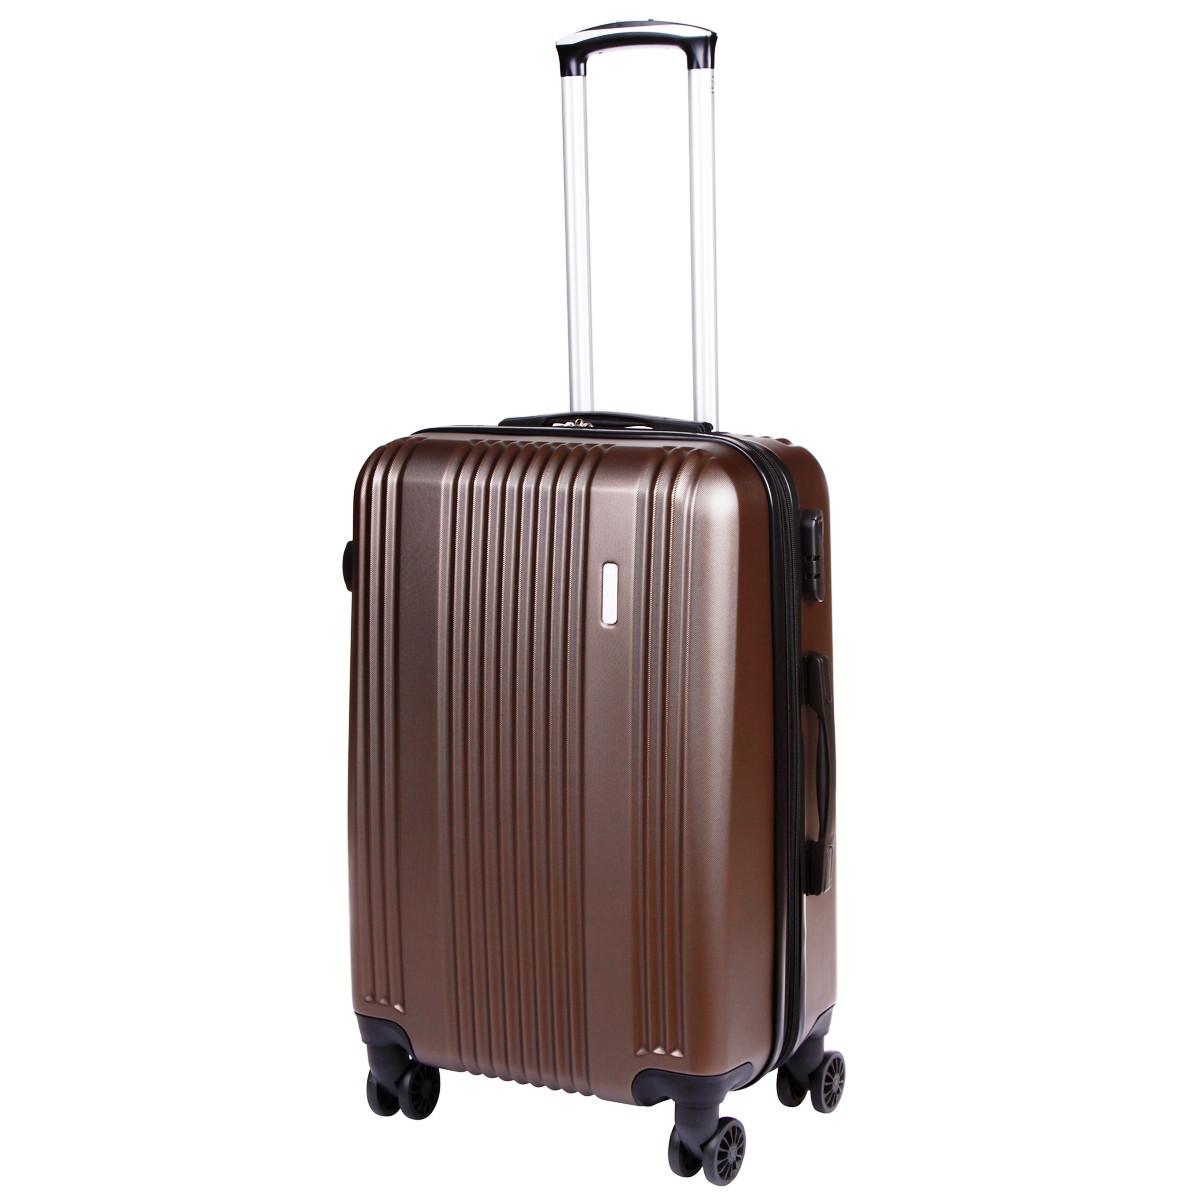 Чемодан с расширением OULANDO средний 4 колеса 42х60х27(+3)  пластик  ABS коричневый ксЛ516-24кор